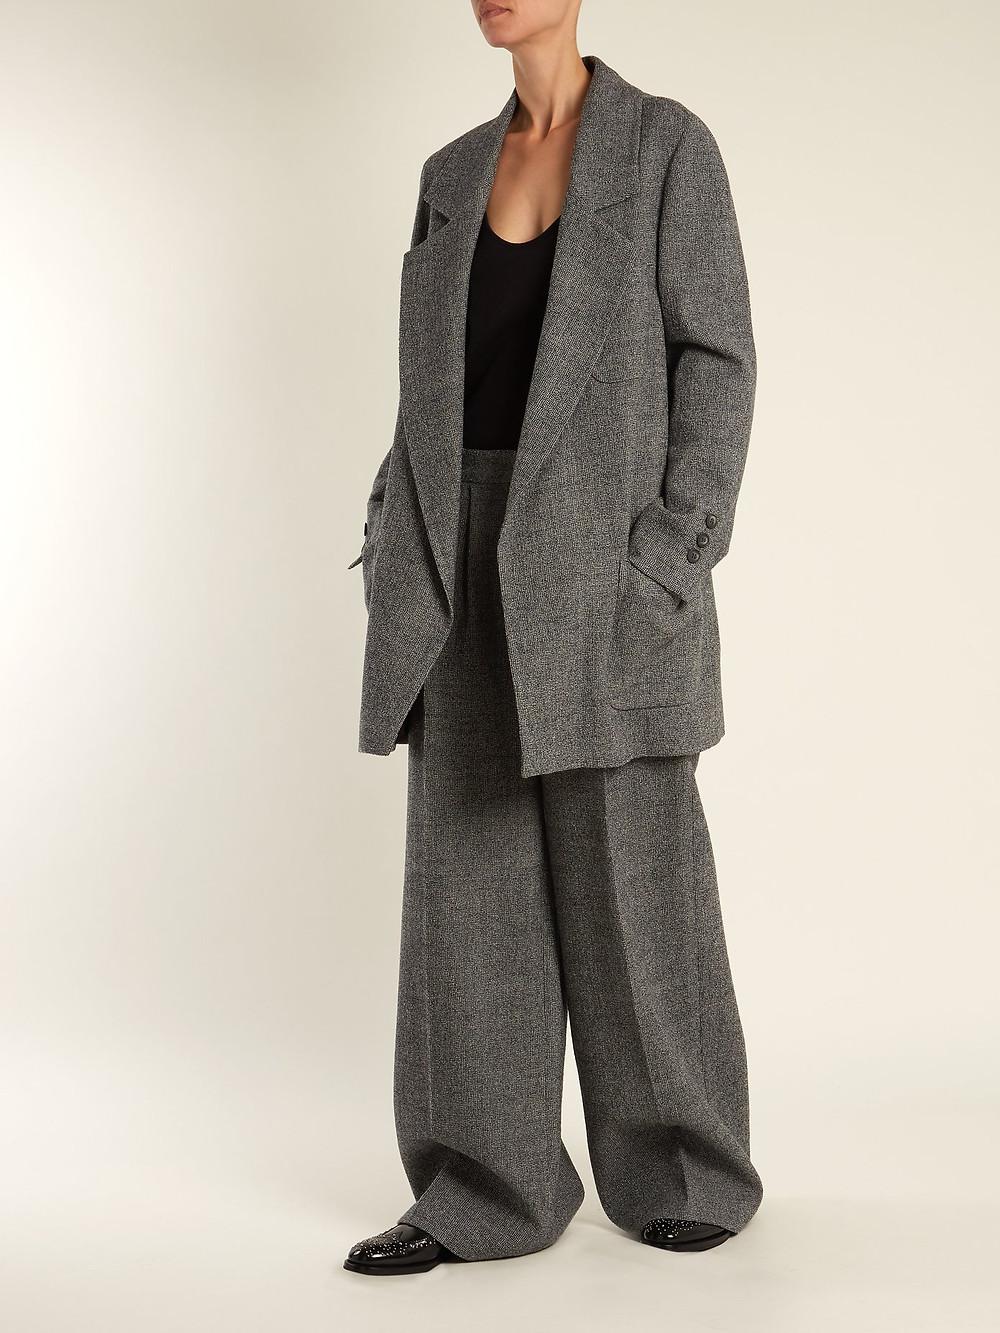 RAEY Oversized wool-tweed blazer $456